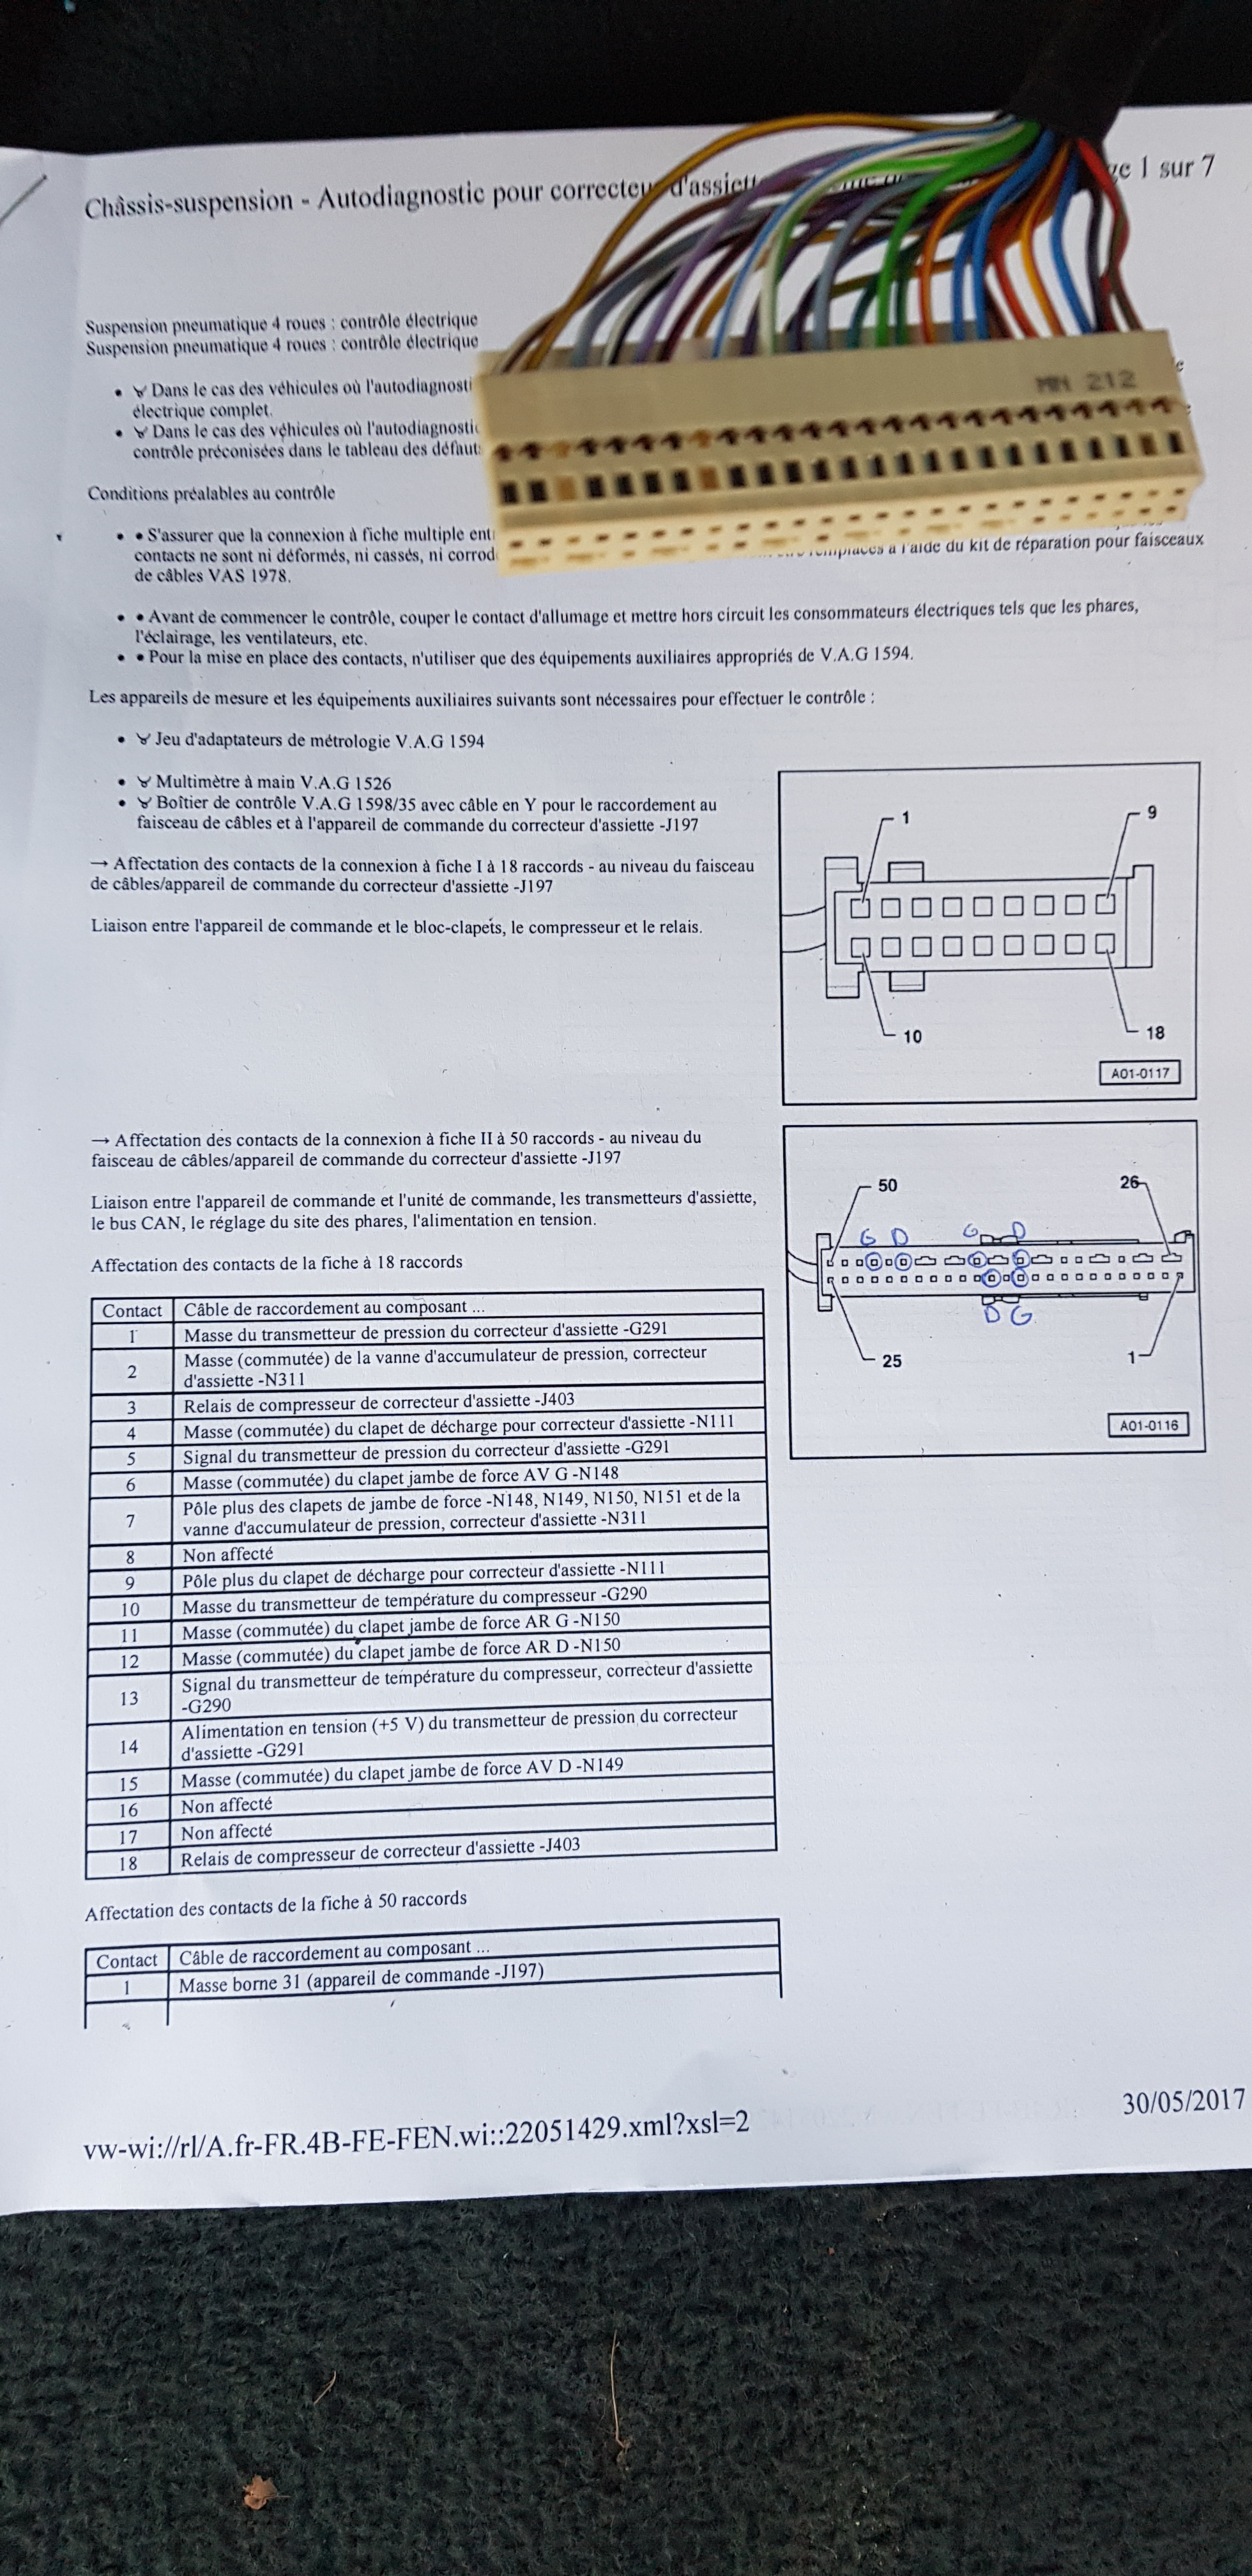 Jeu de filtres Wartungskit inspection S audi a6 4b 4,2 QUATTRO s6 299 340ps